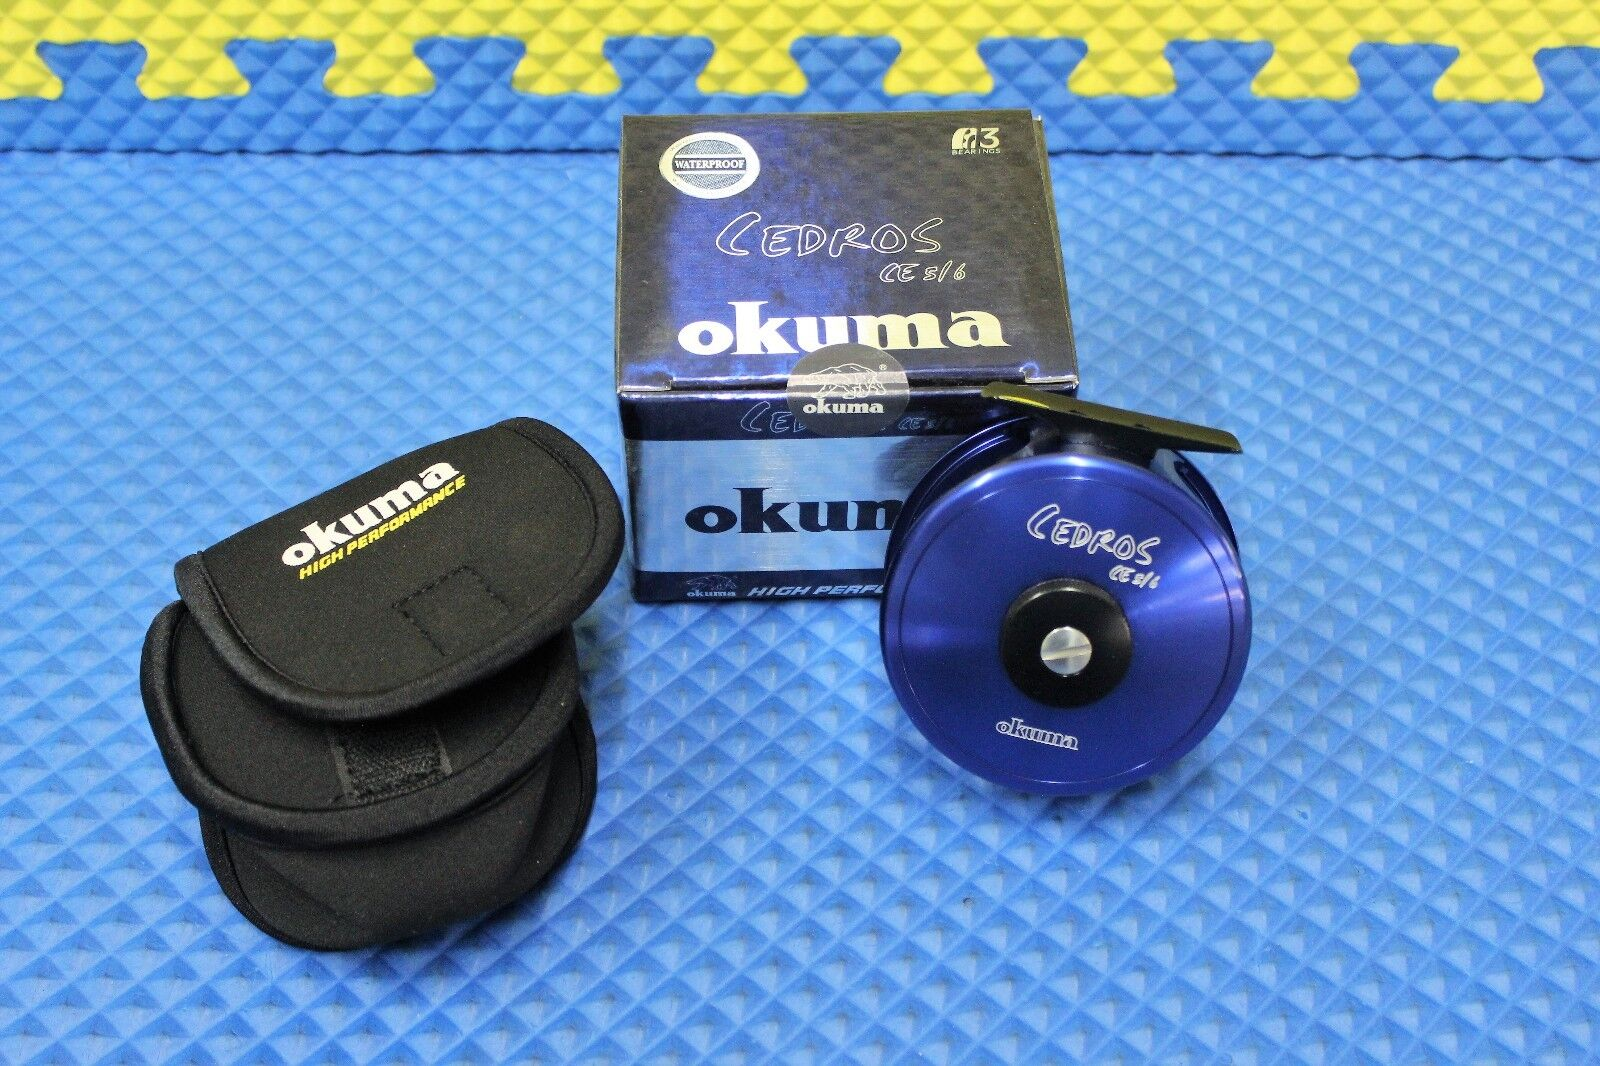 Okuma Cedros Saltwater Fly Fishing Reel Waterproof Drag System Model CE 5 6